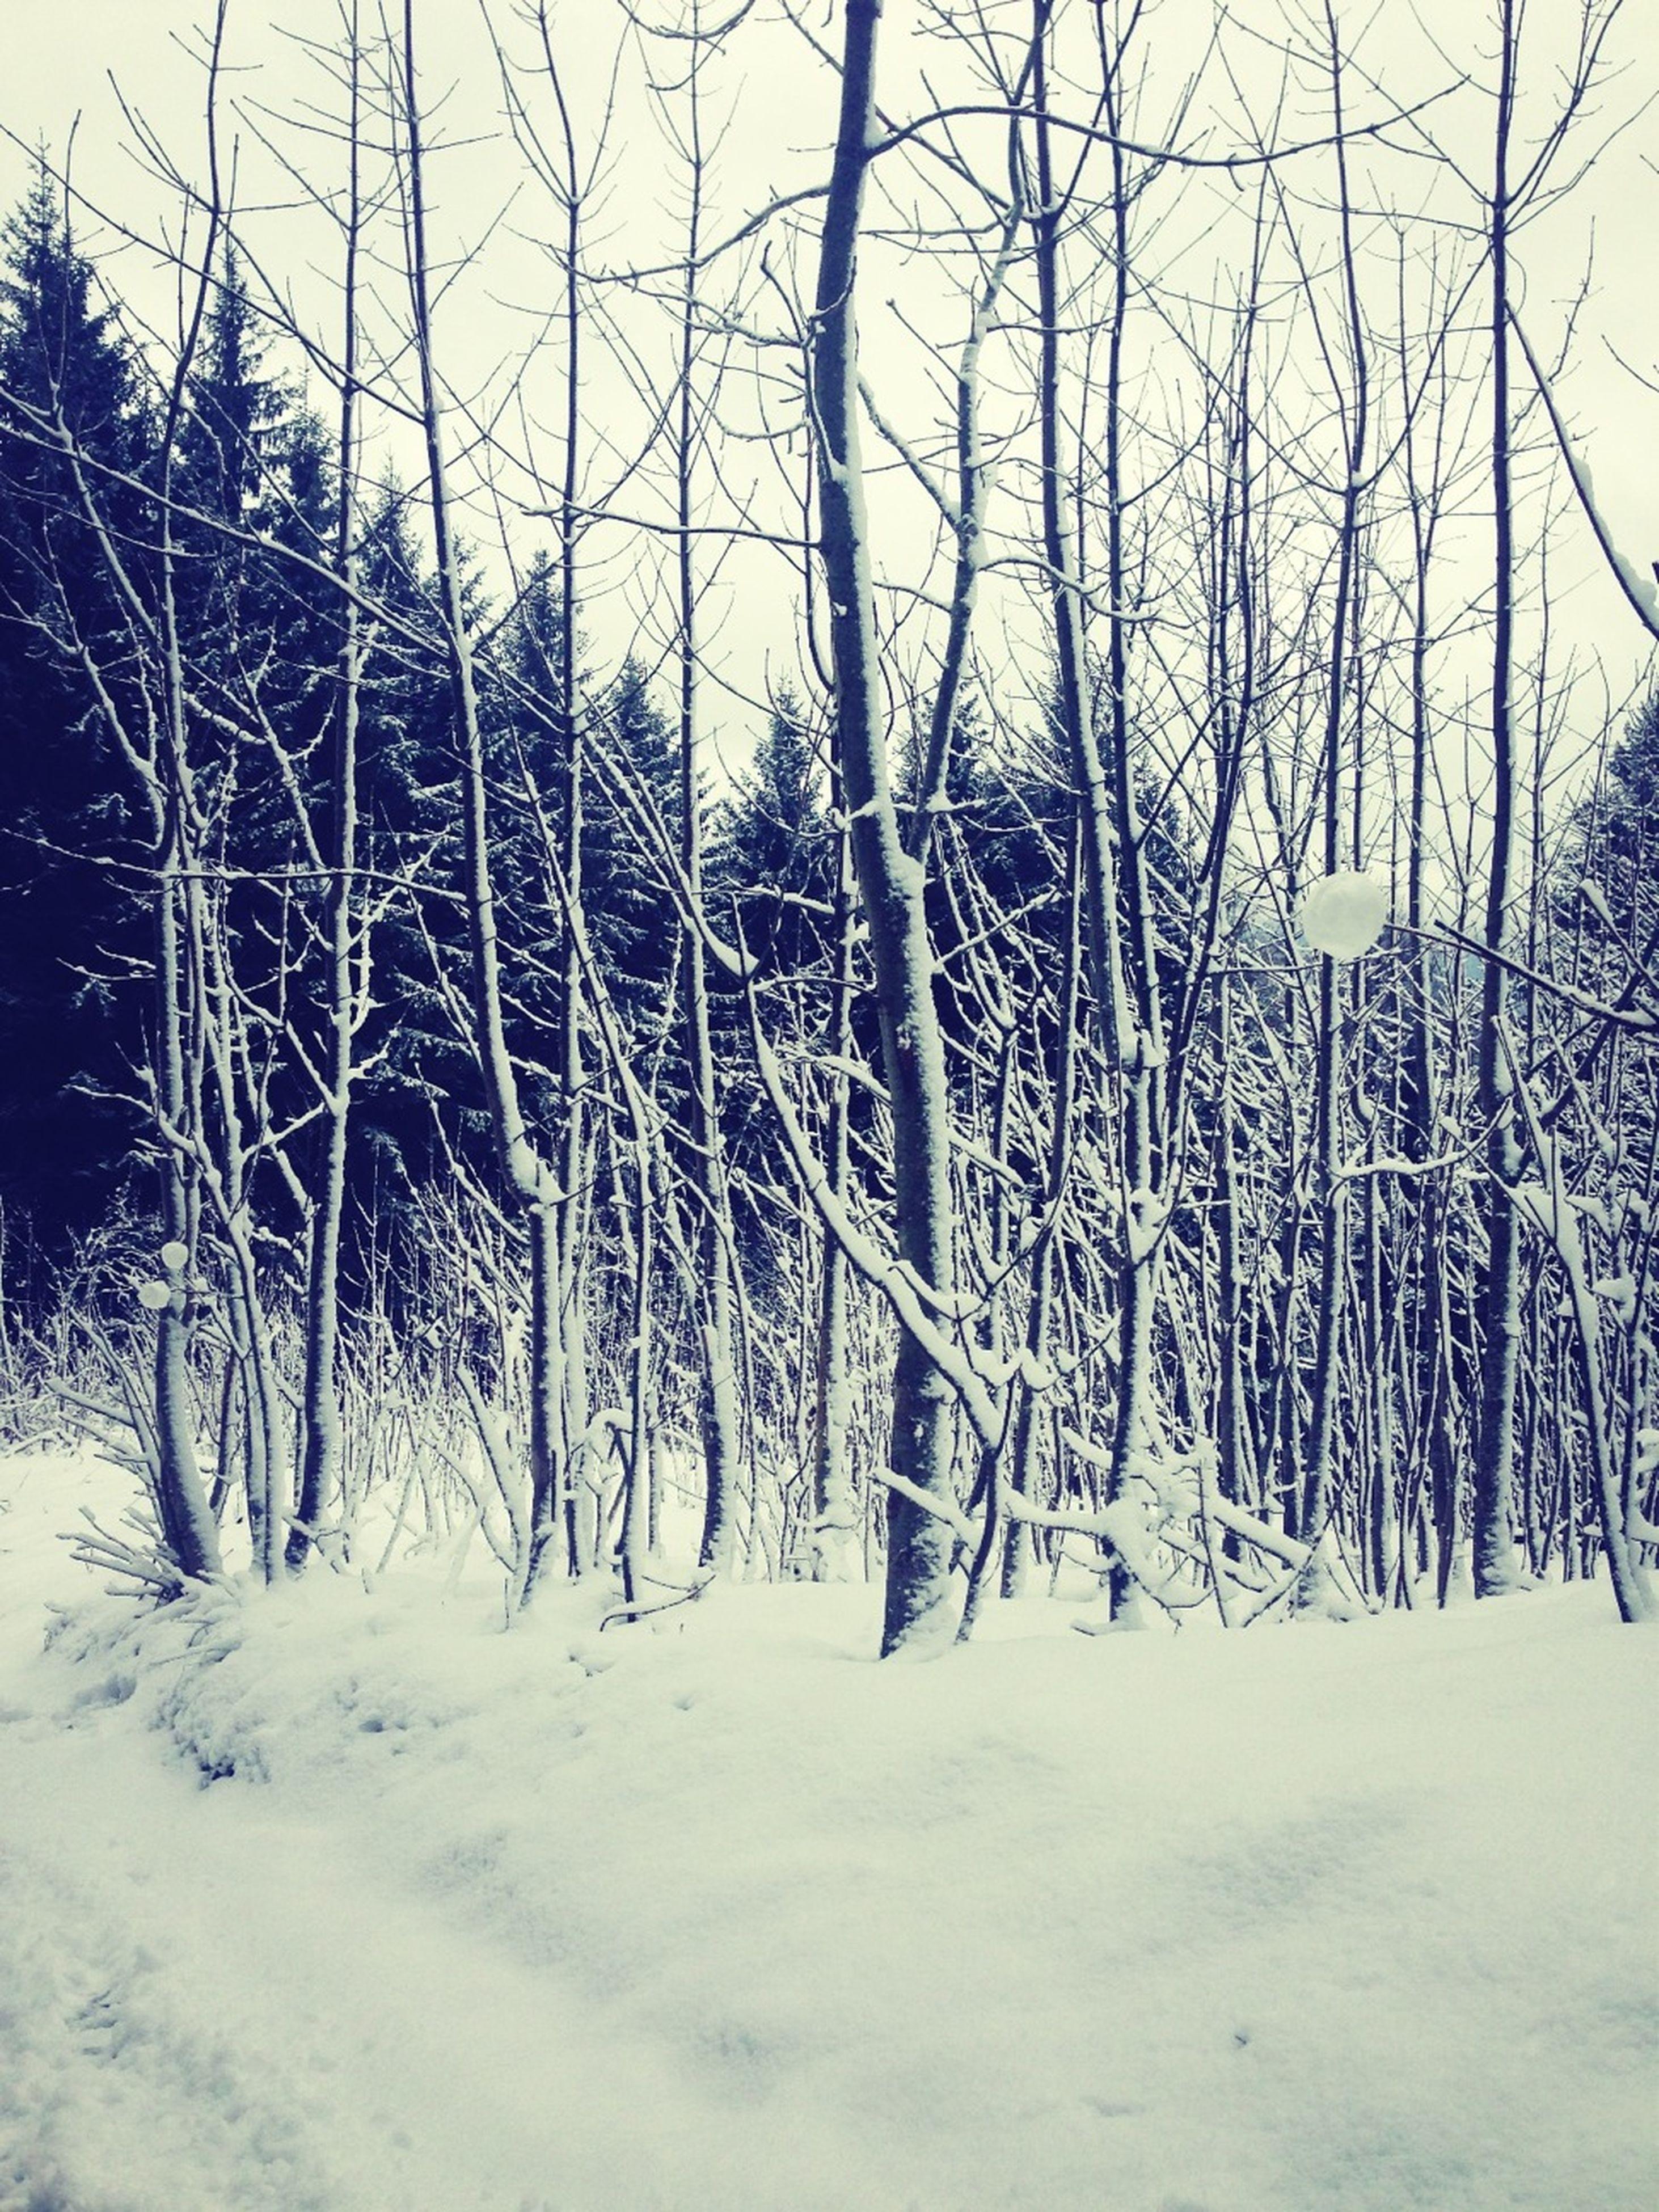 tree, snow, winter, cold temperature, bare tree, tranquility, branch, tranquil scene, nature, landscape, scenics, beauty in nature, growth, tree trunk, non-urban scene, season, covering, field, sky, day